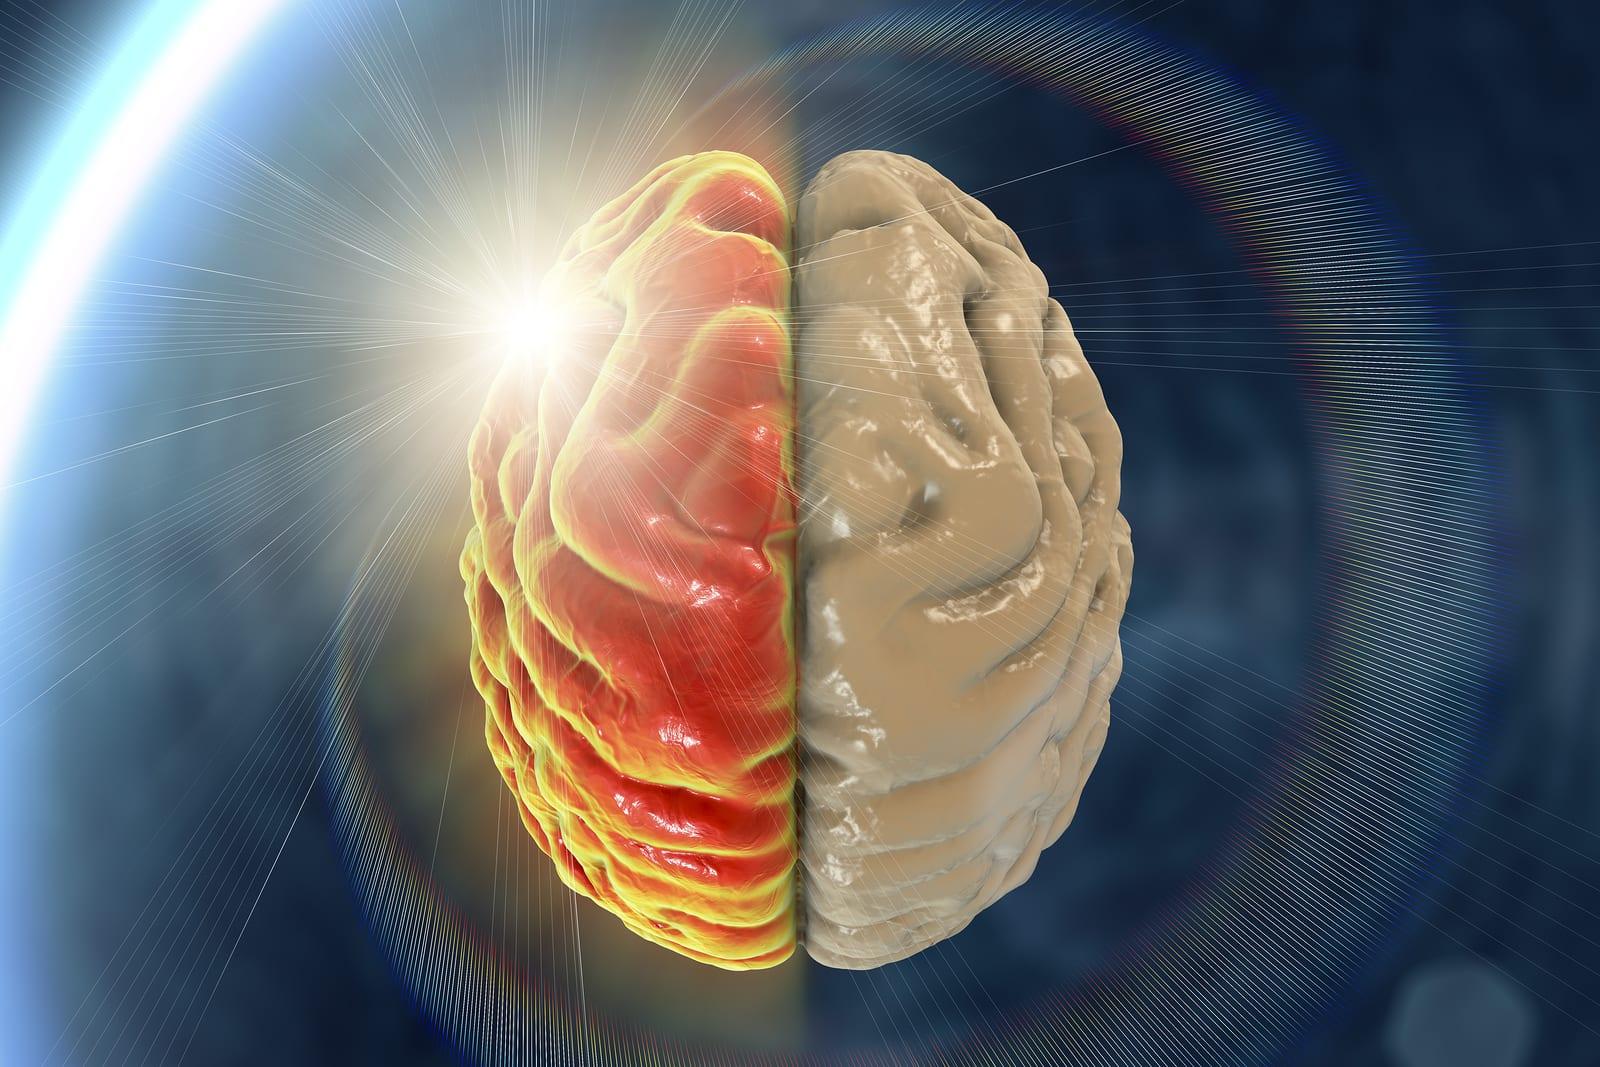 Migraine, hemicrania, medical concept showing pain in half of brain and migraine aura, 3D illustration